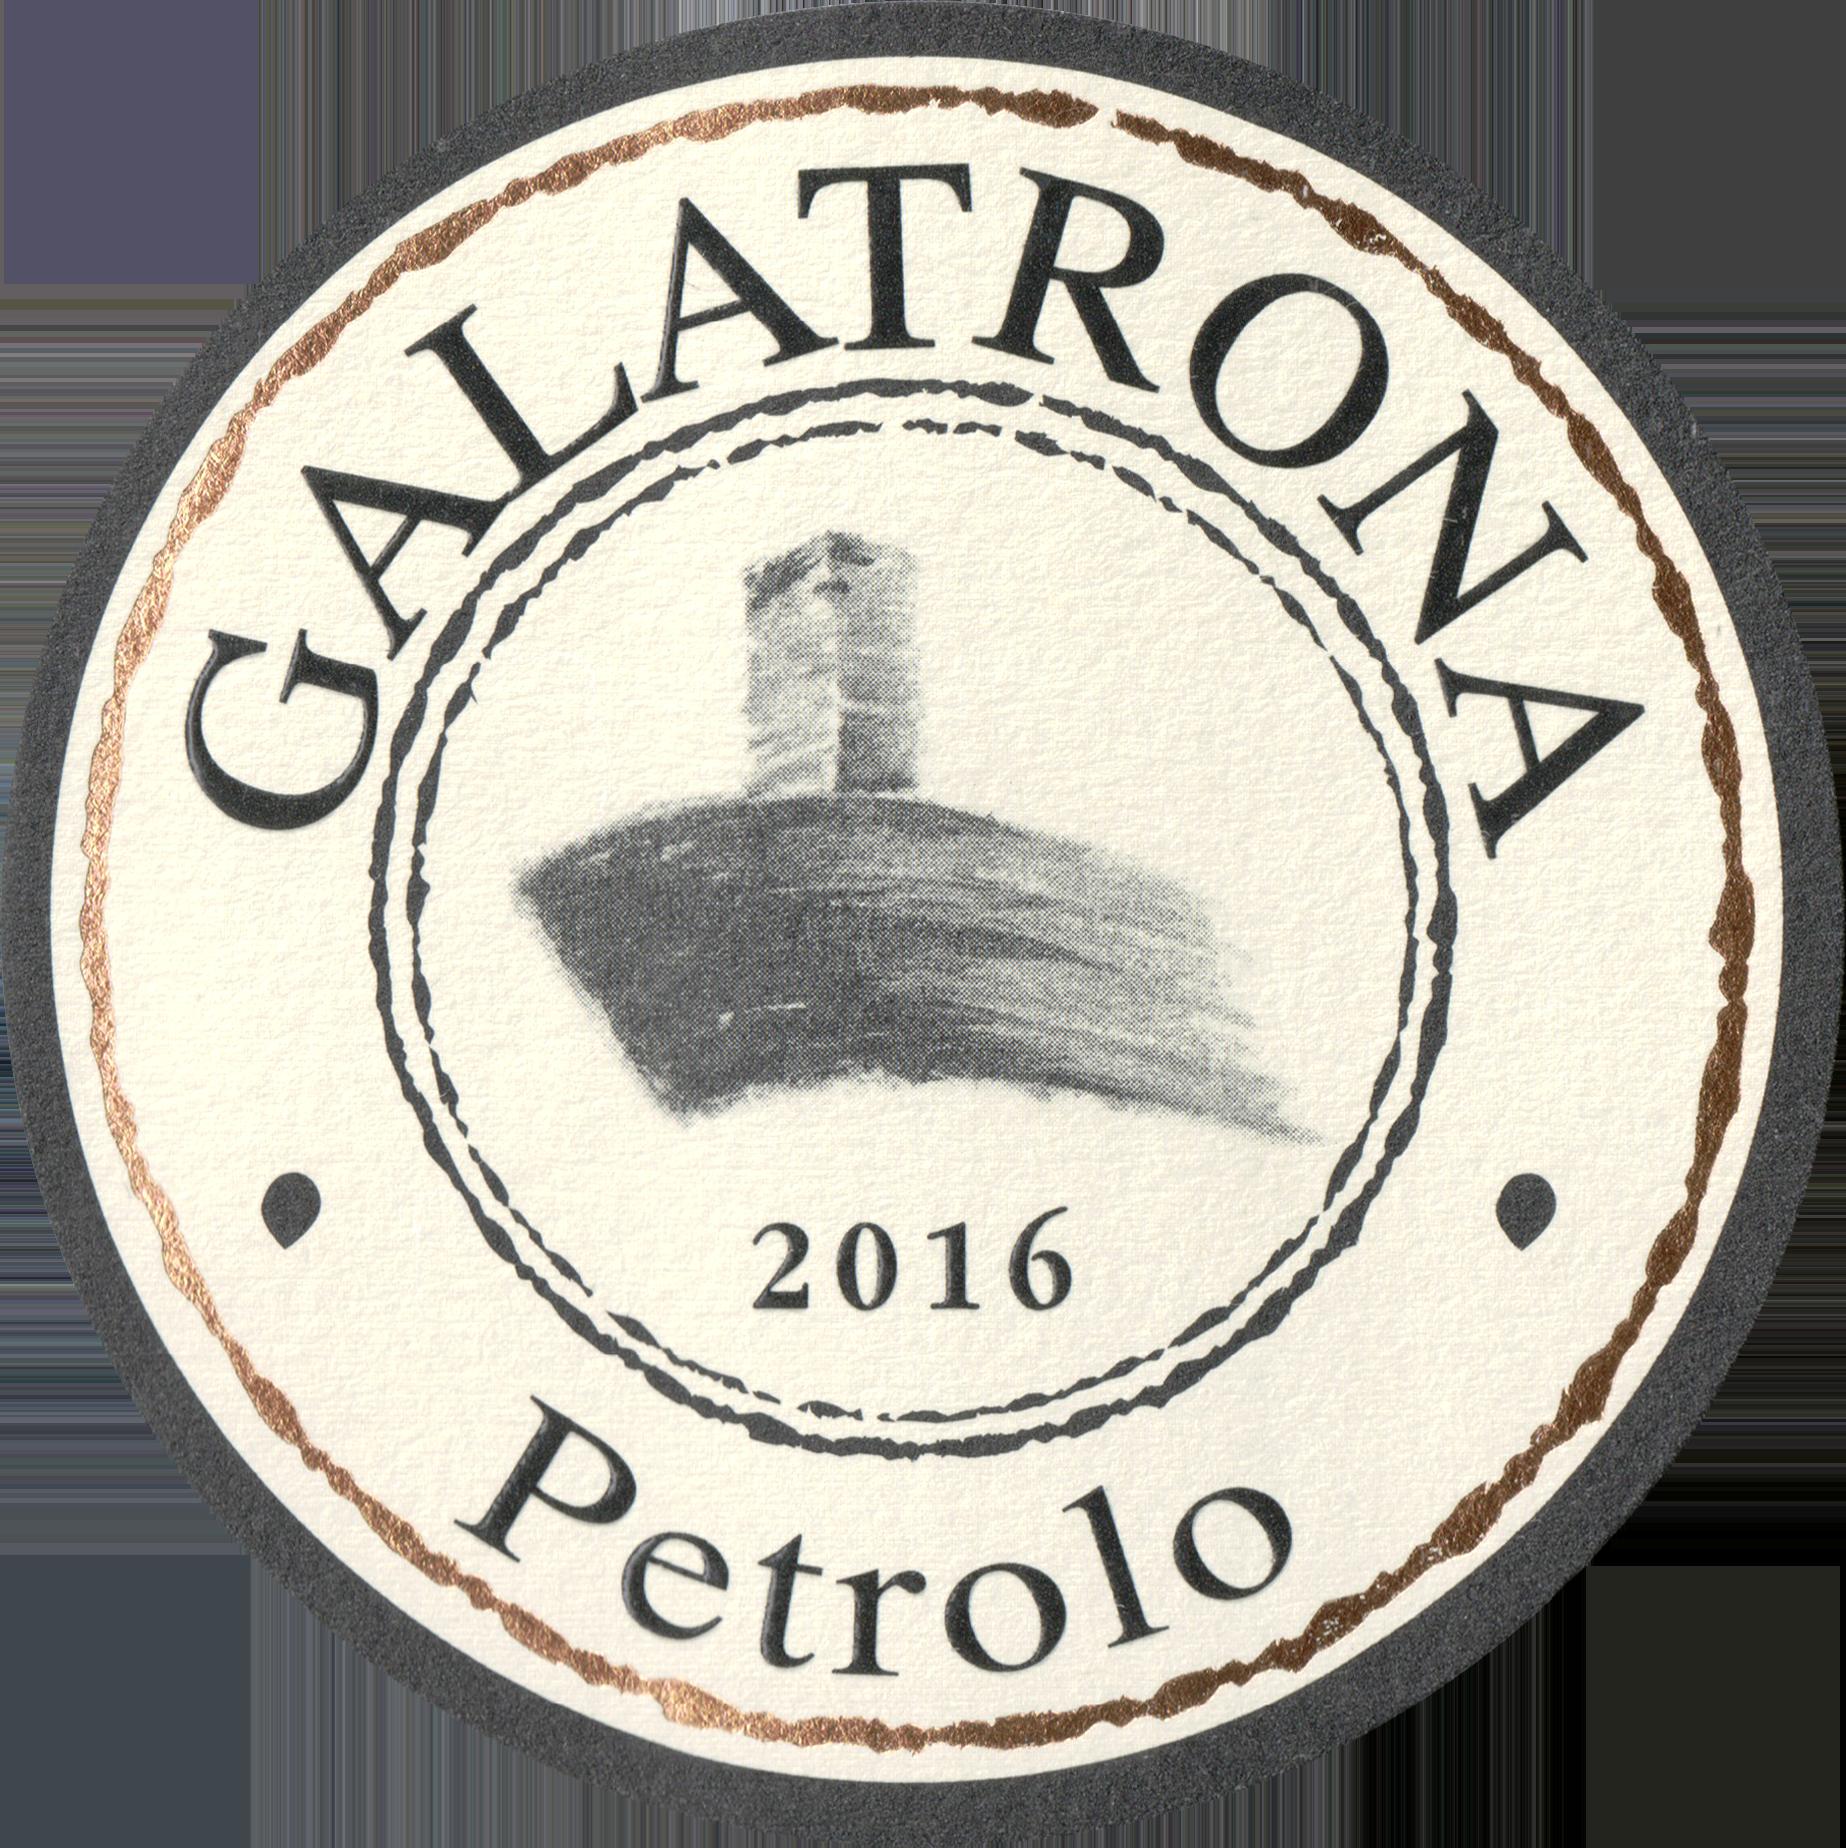 Petrolo Galatrona 2016